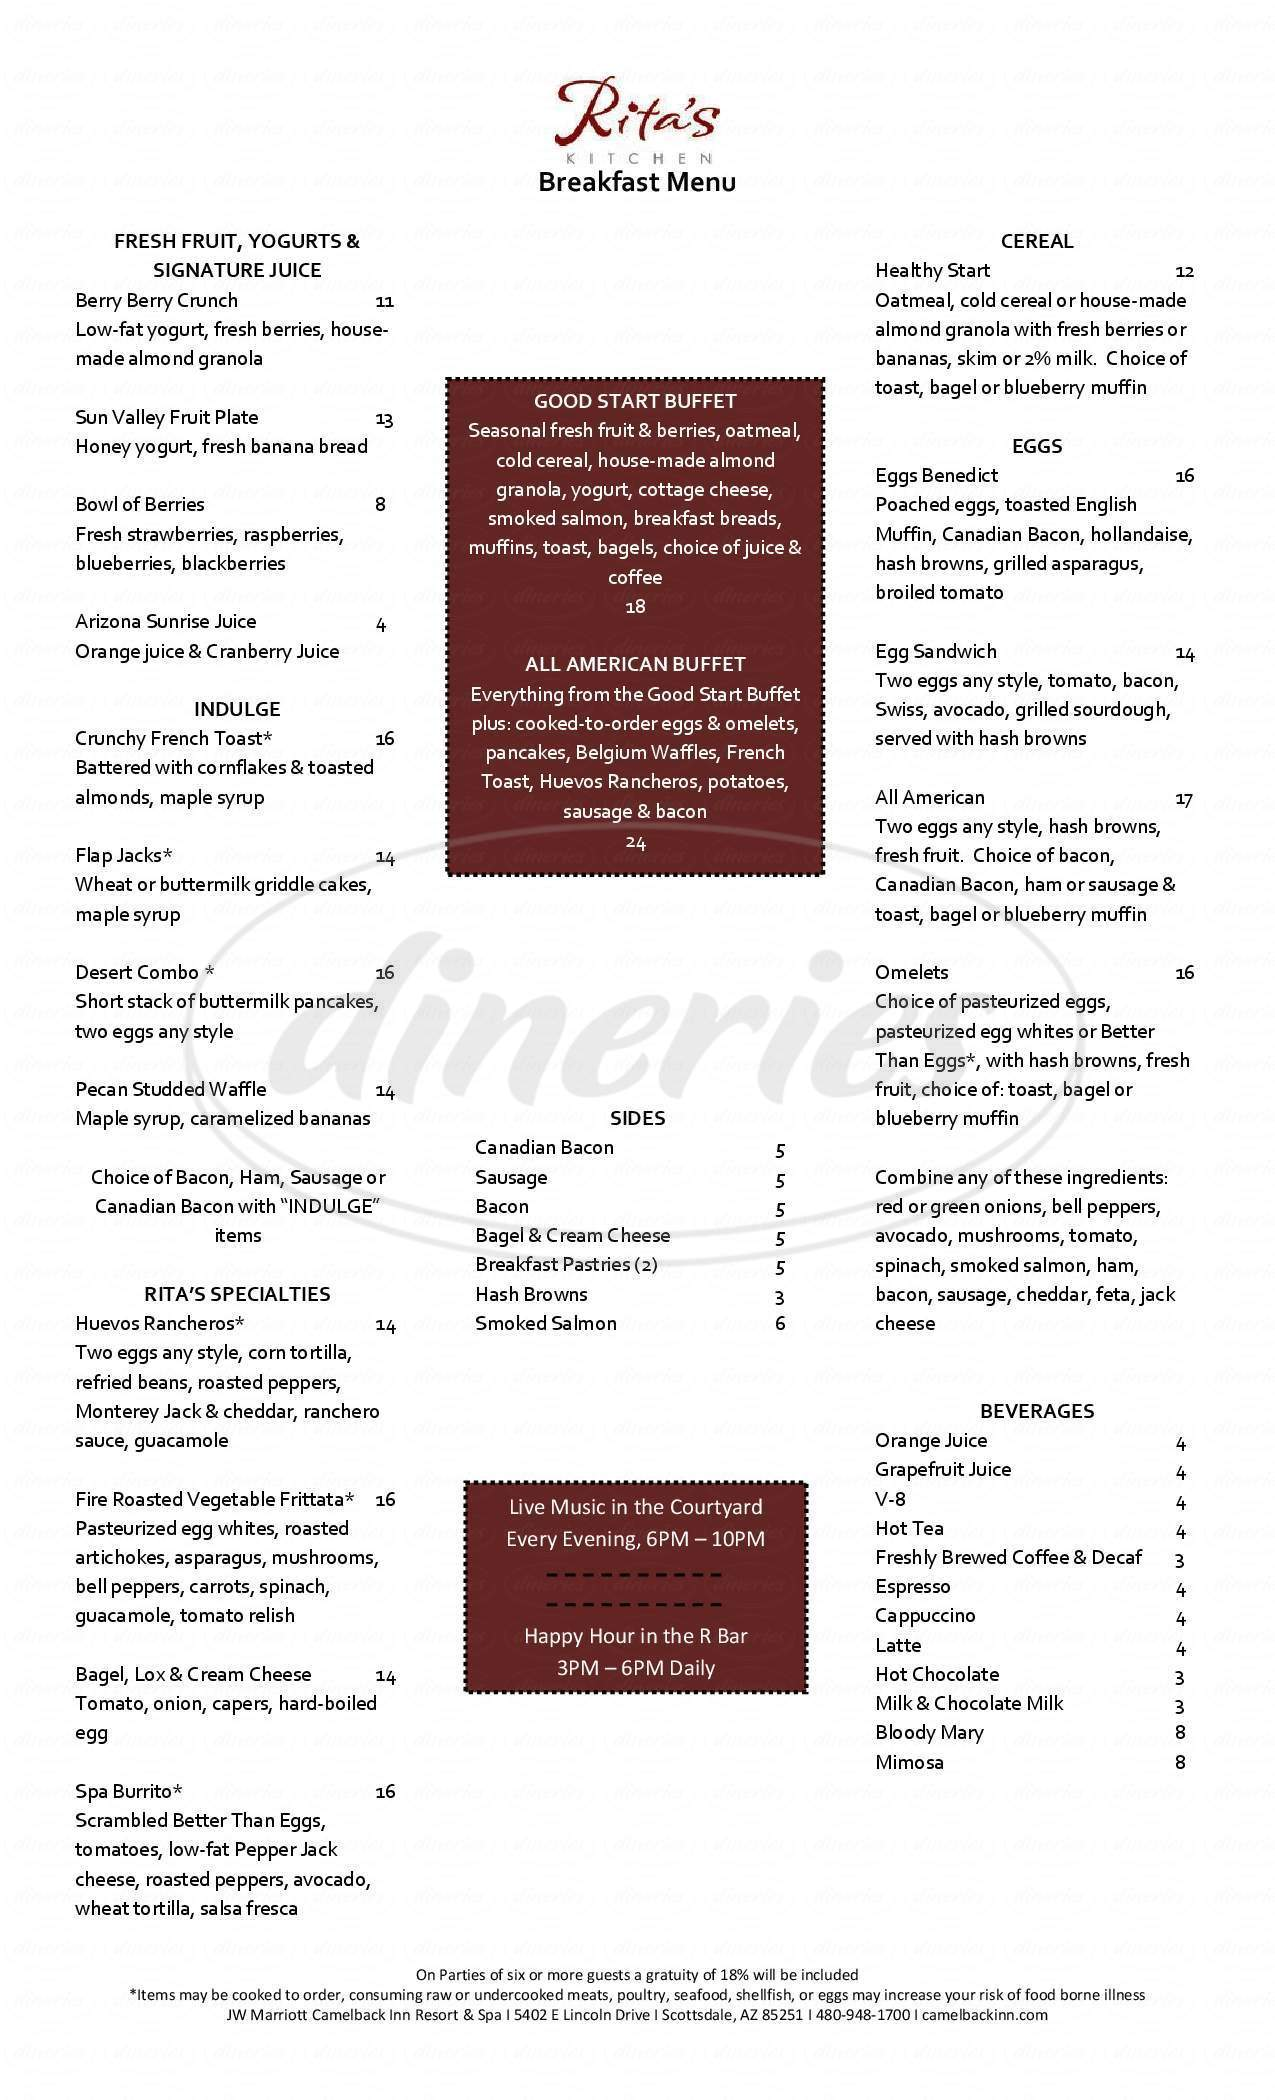 menu for Rita's Kitchen